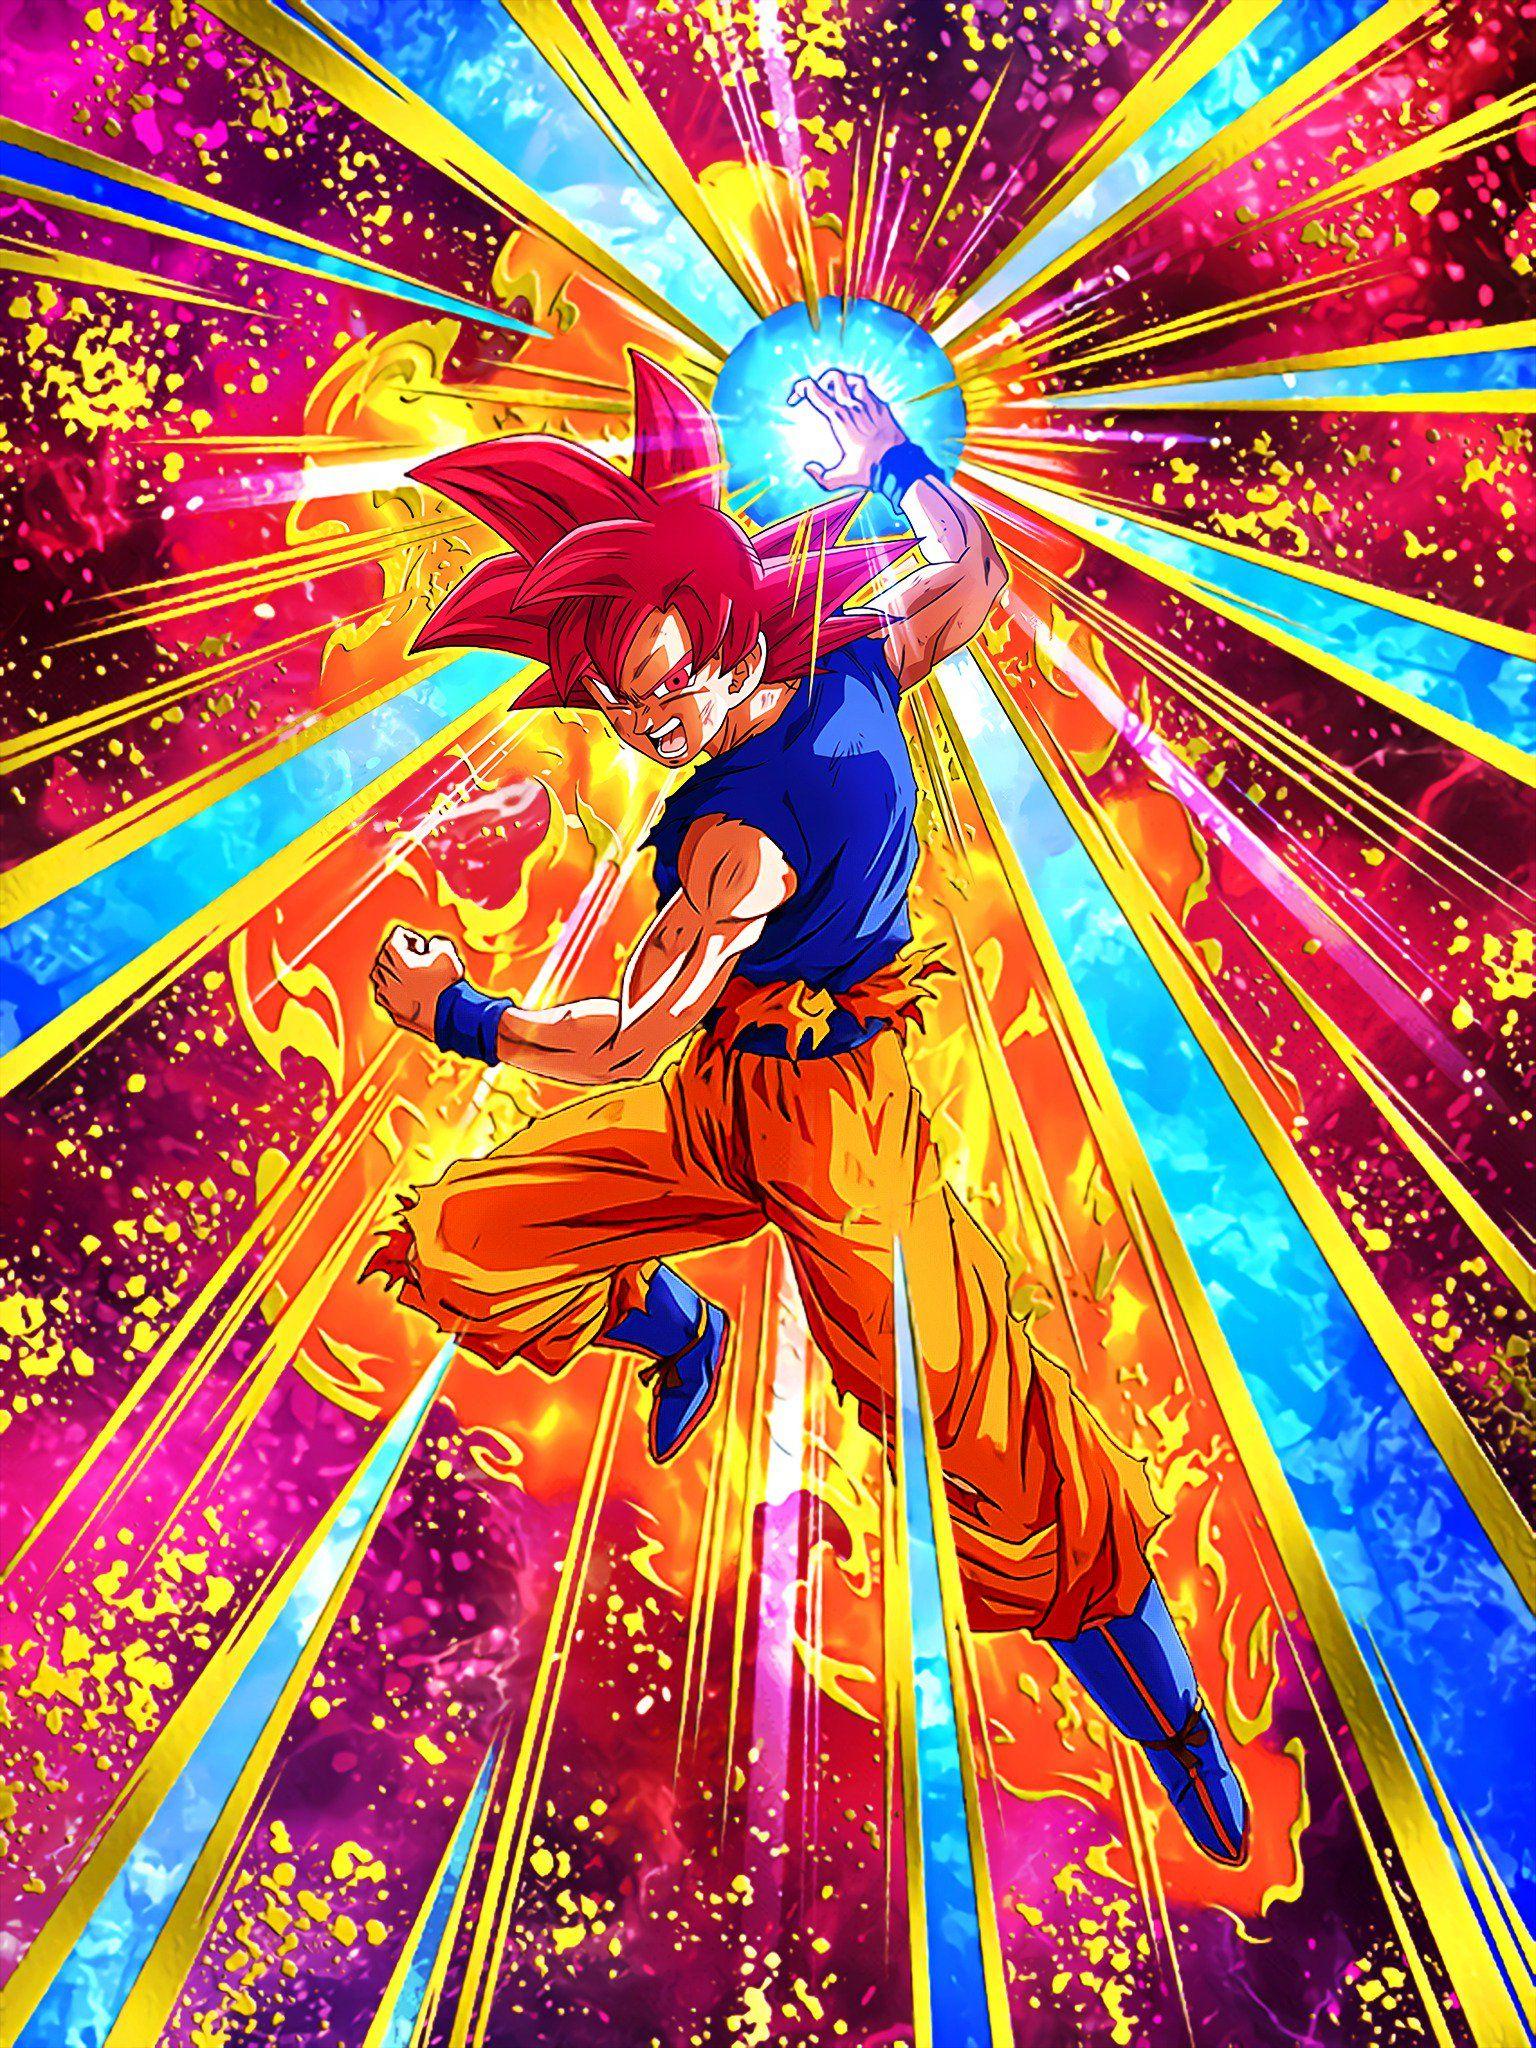 4480bb0af58422adeacb2d528a1cf24e - How To Get Super Saiyan God Goku In Dokkan Battle